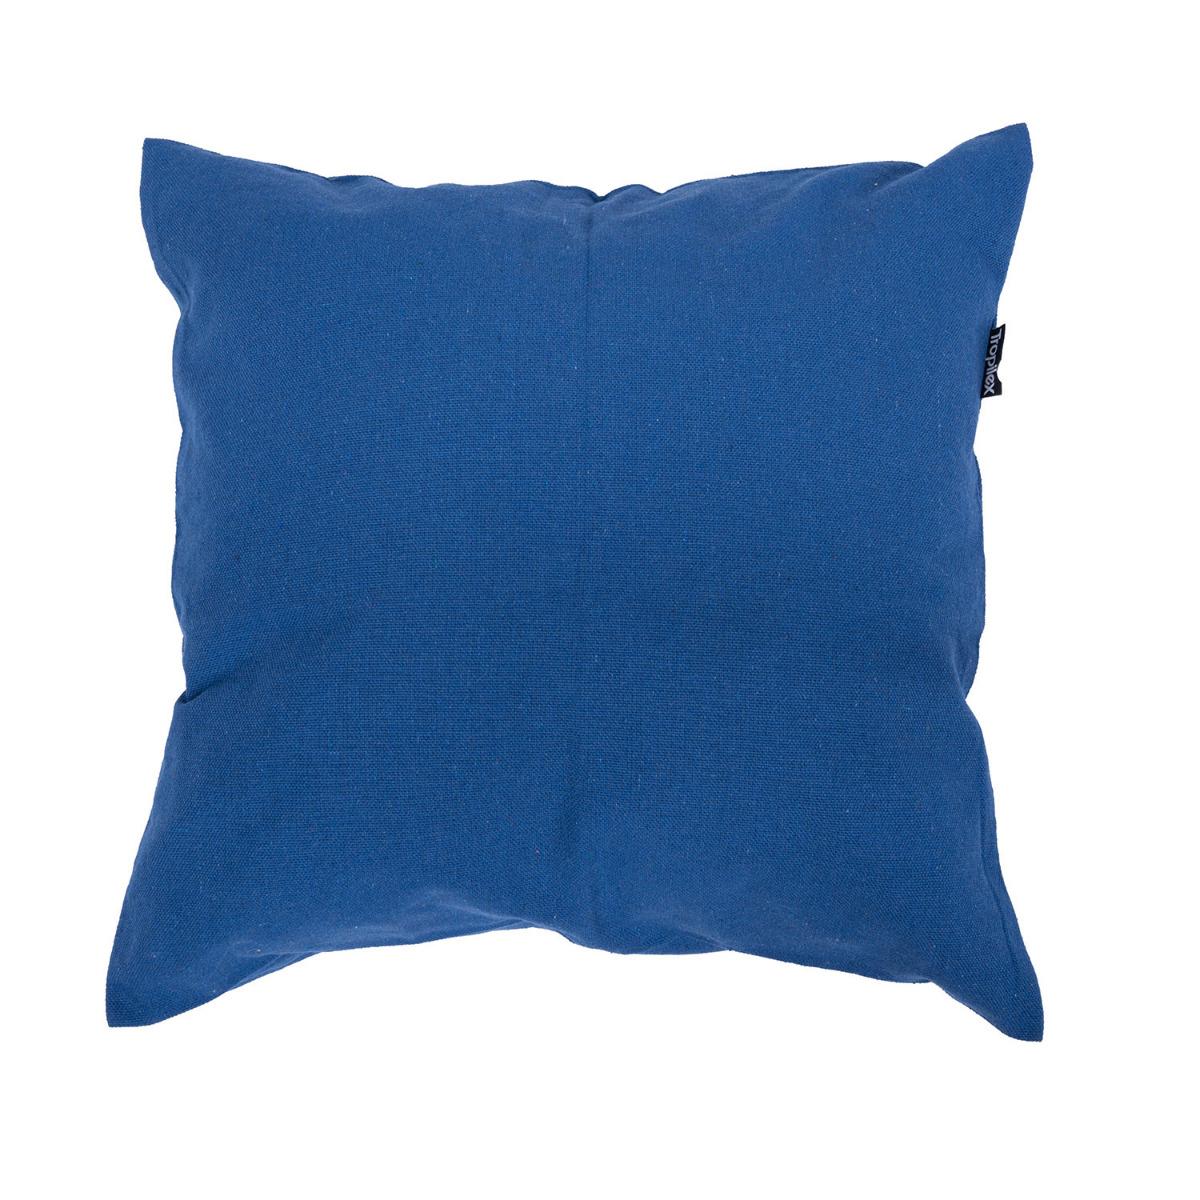 Kussen 'Plain' Blue - Blauw - Tropilex �